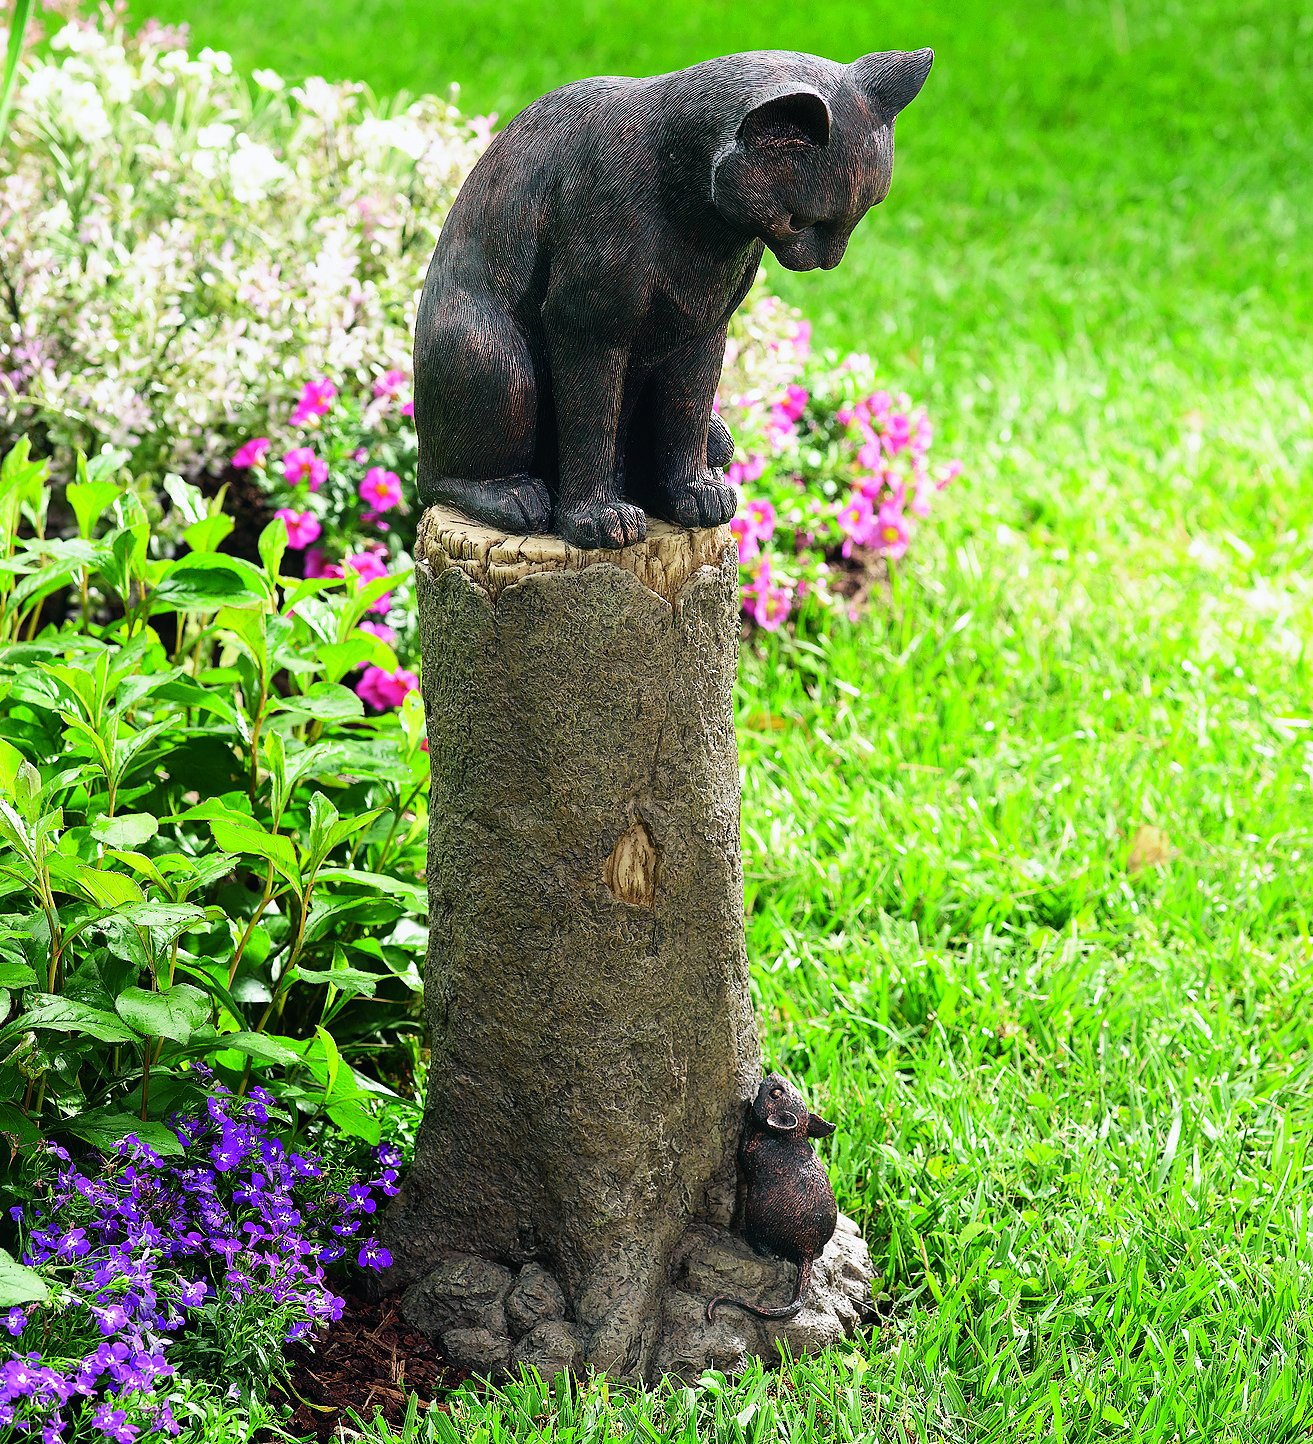 Amazon.com : Plow & Hearth Cat and Mouse Outdoor Garden Decor ...